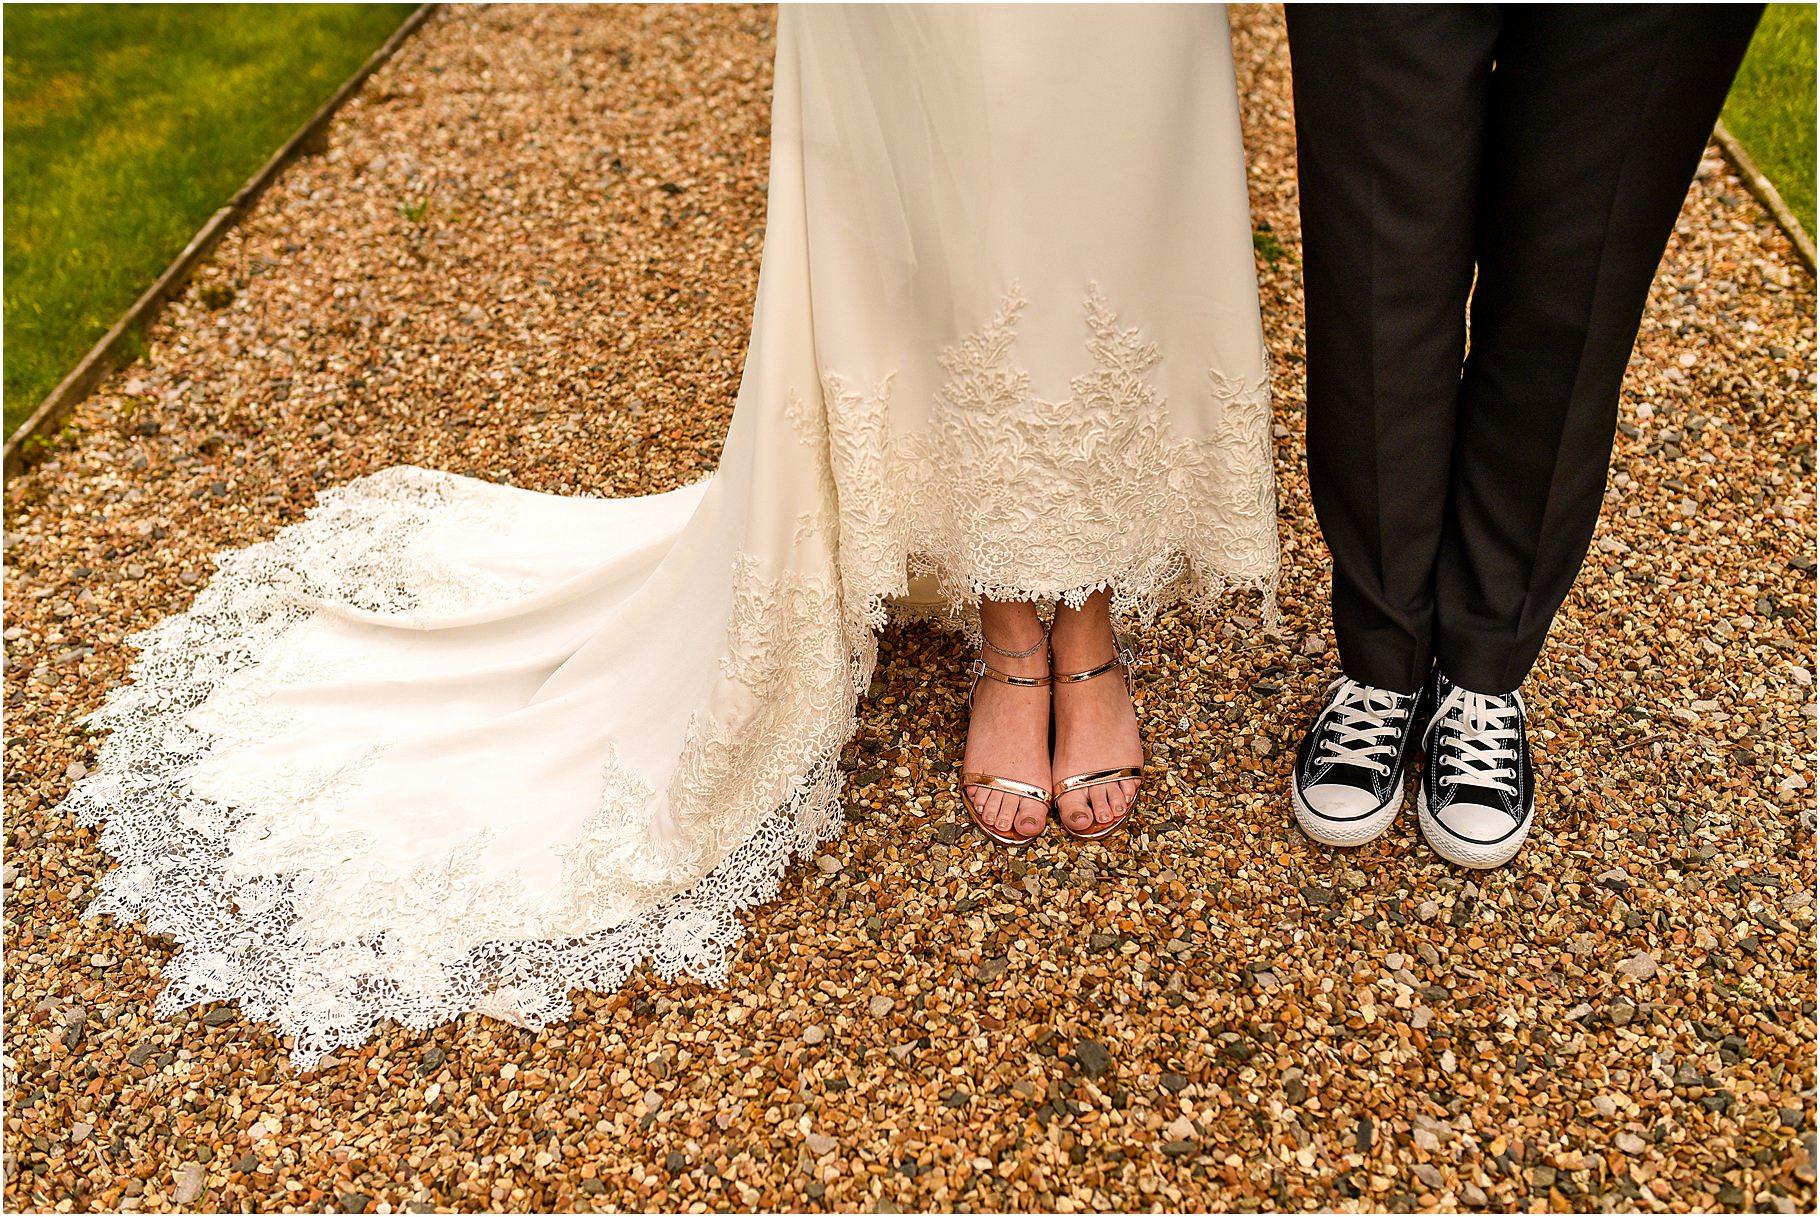 hipping-hall-wedding-093.jpg